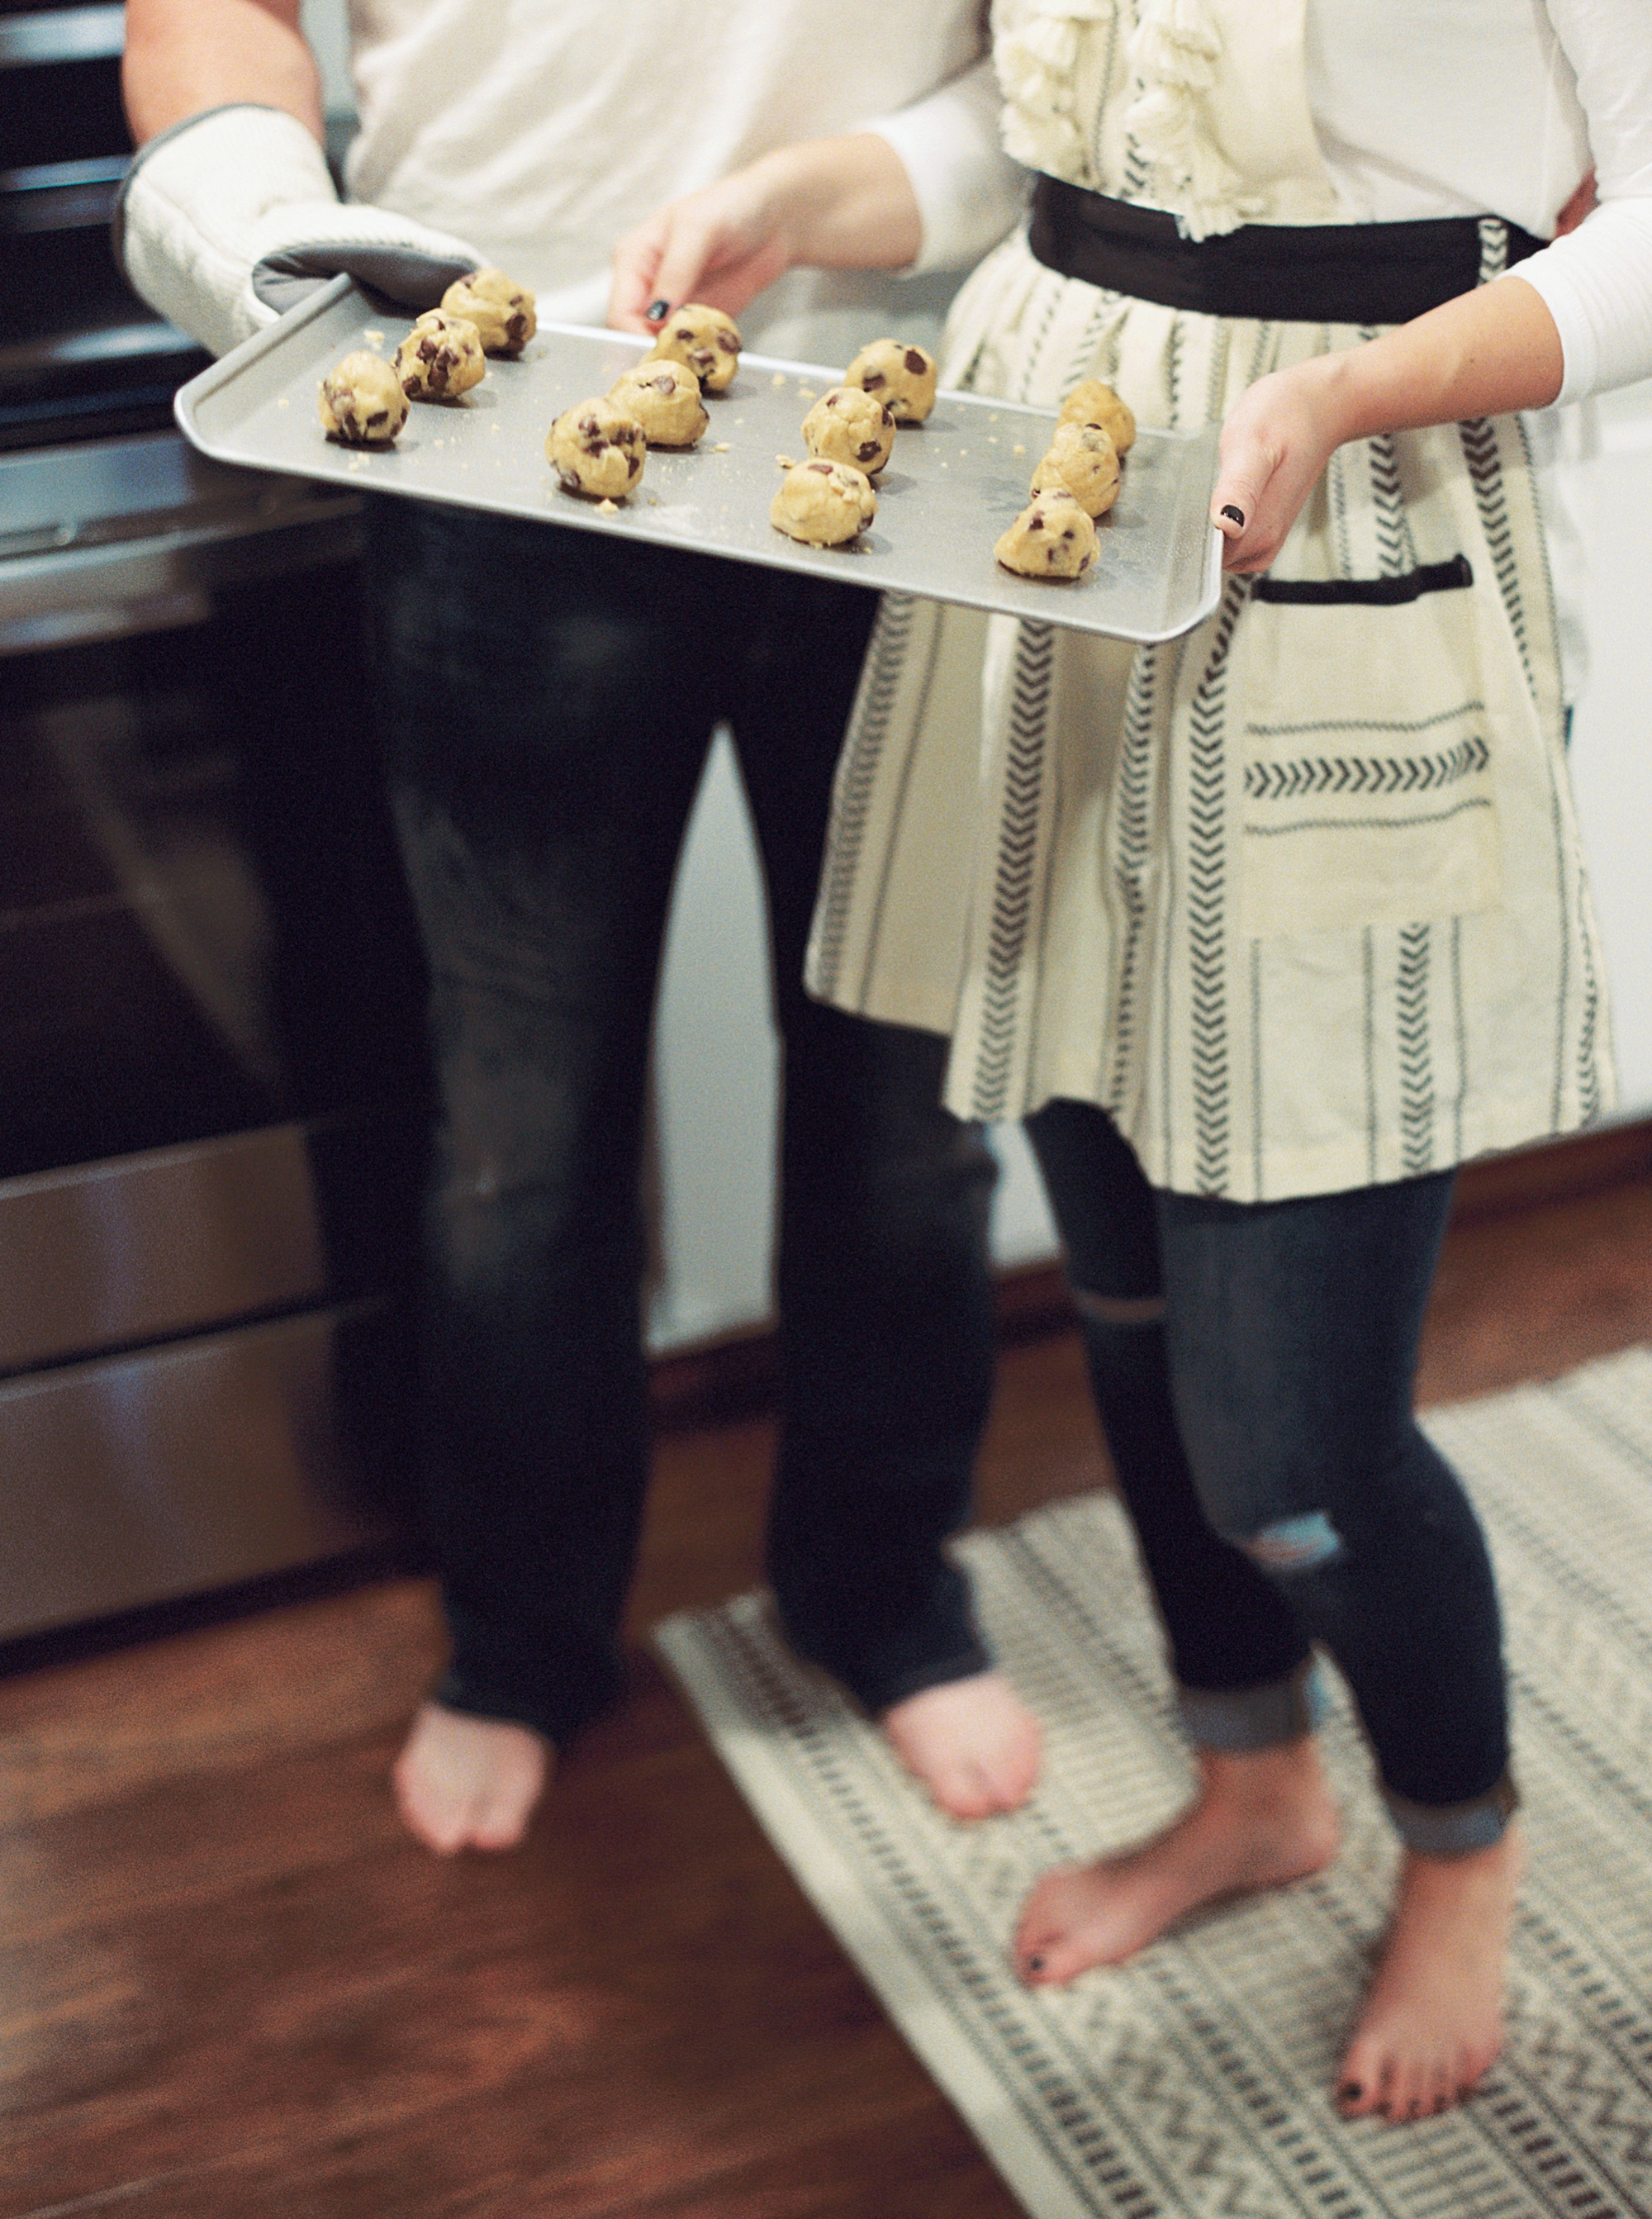 Melanie & Wes - Kitchen Lifestyle Session